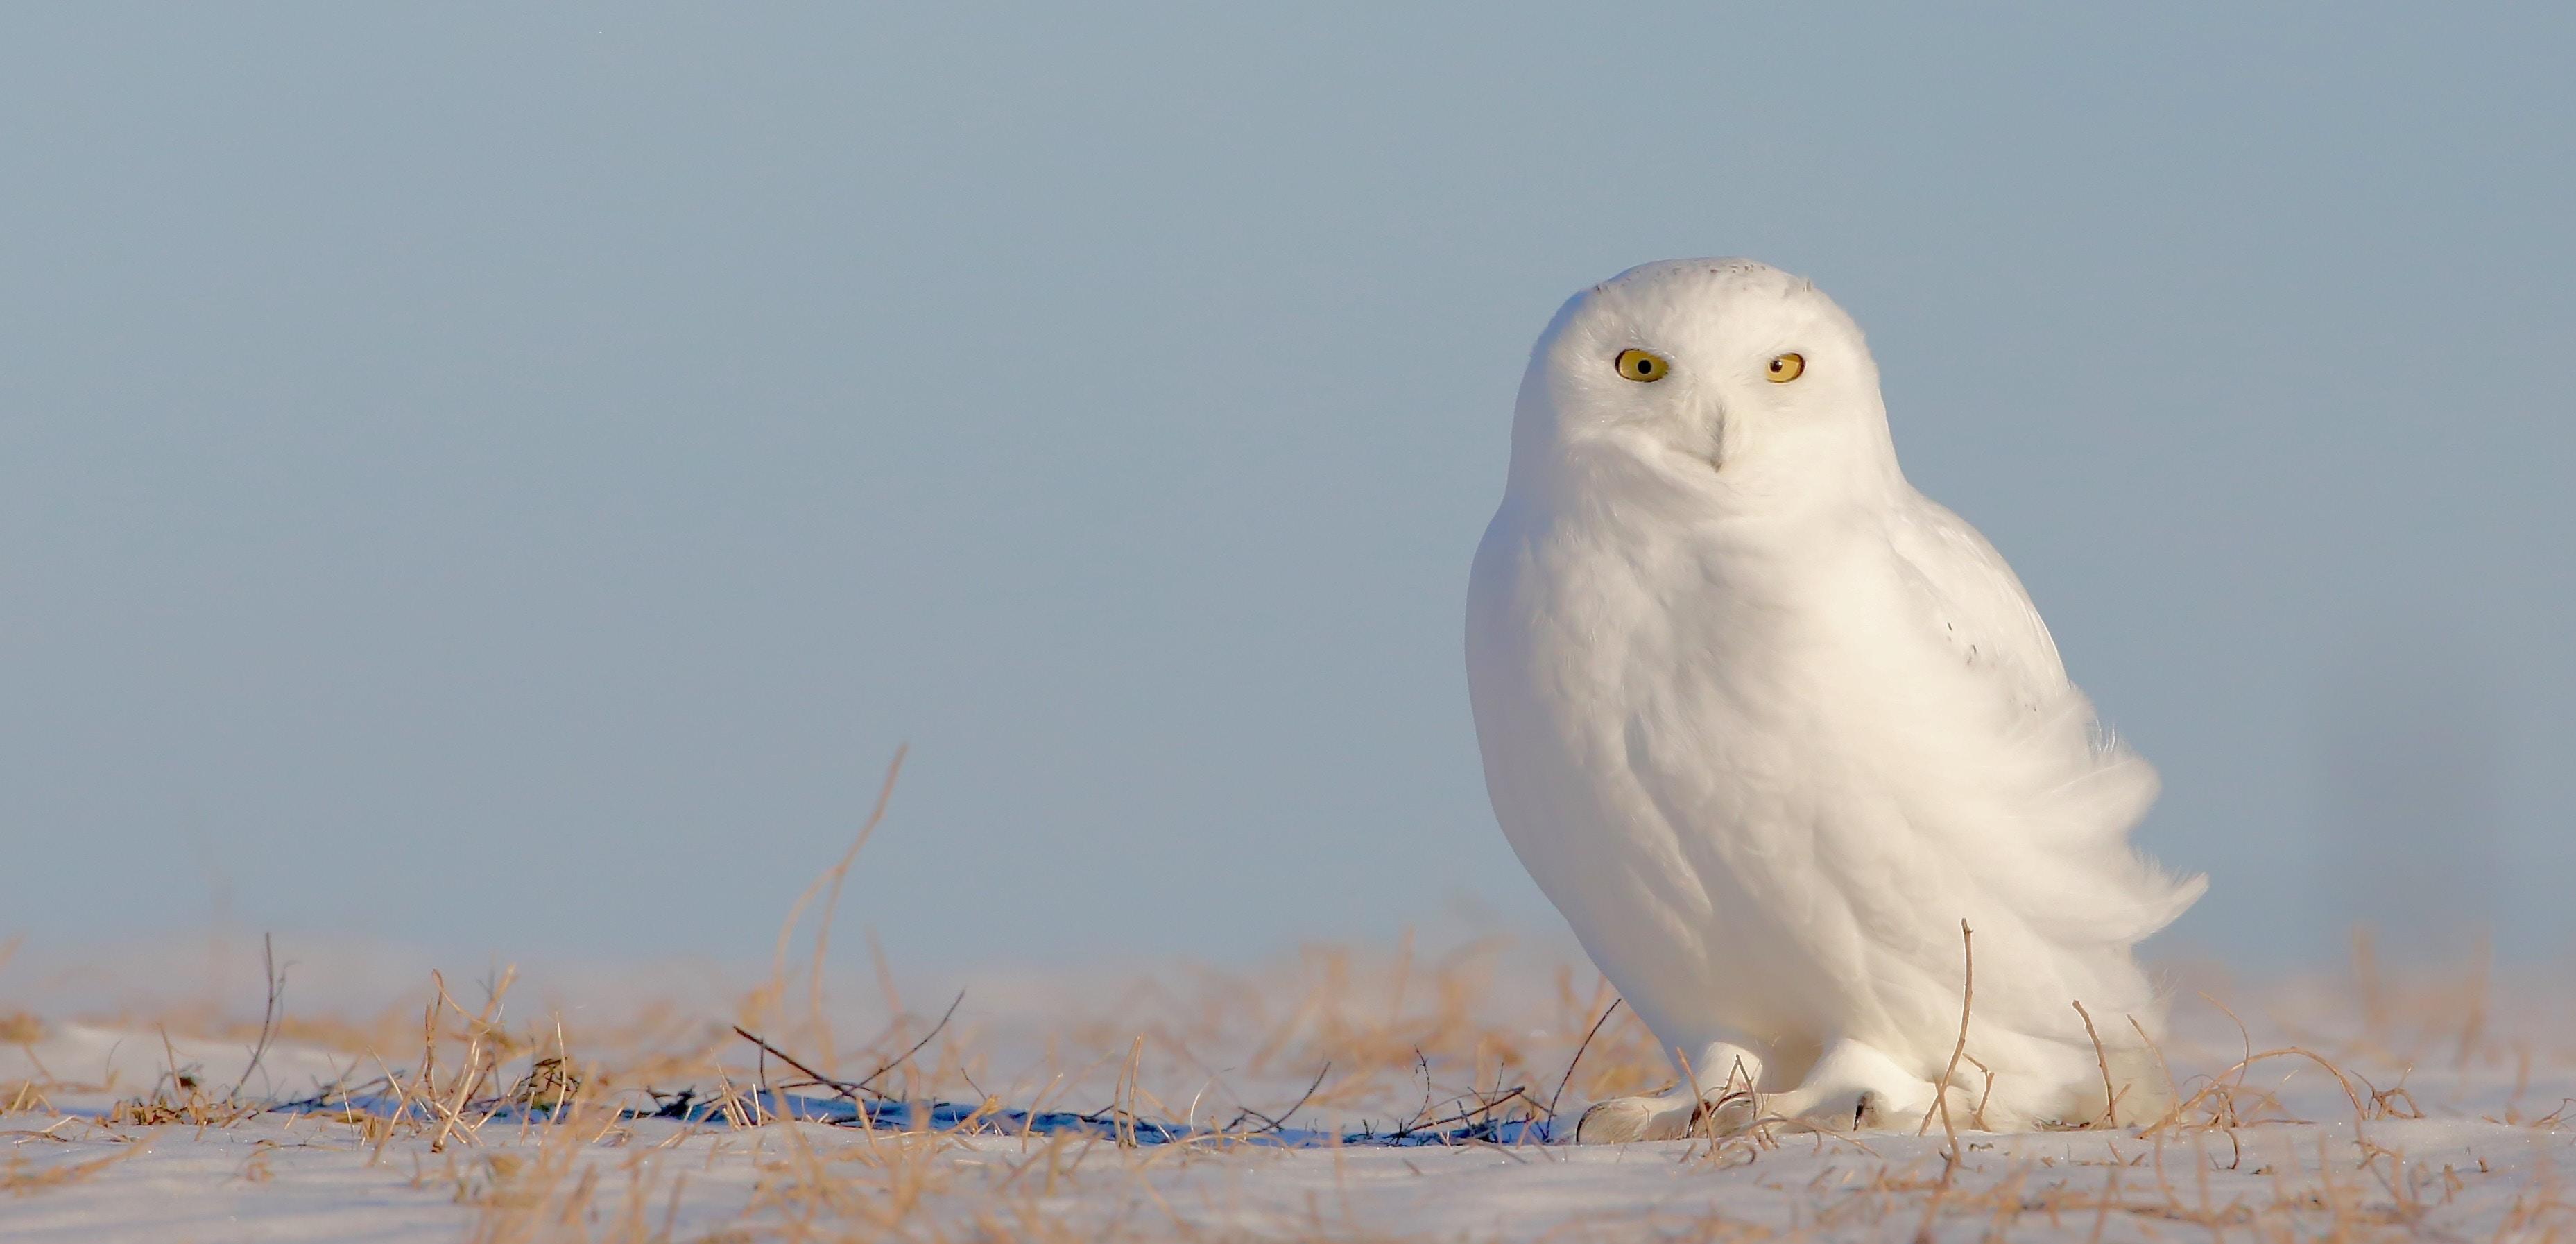 white owl standing